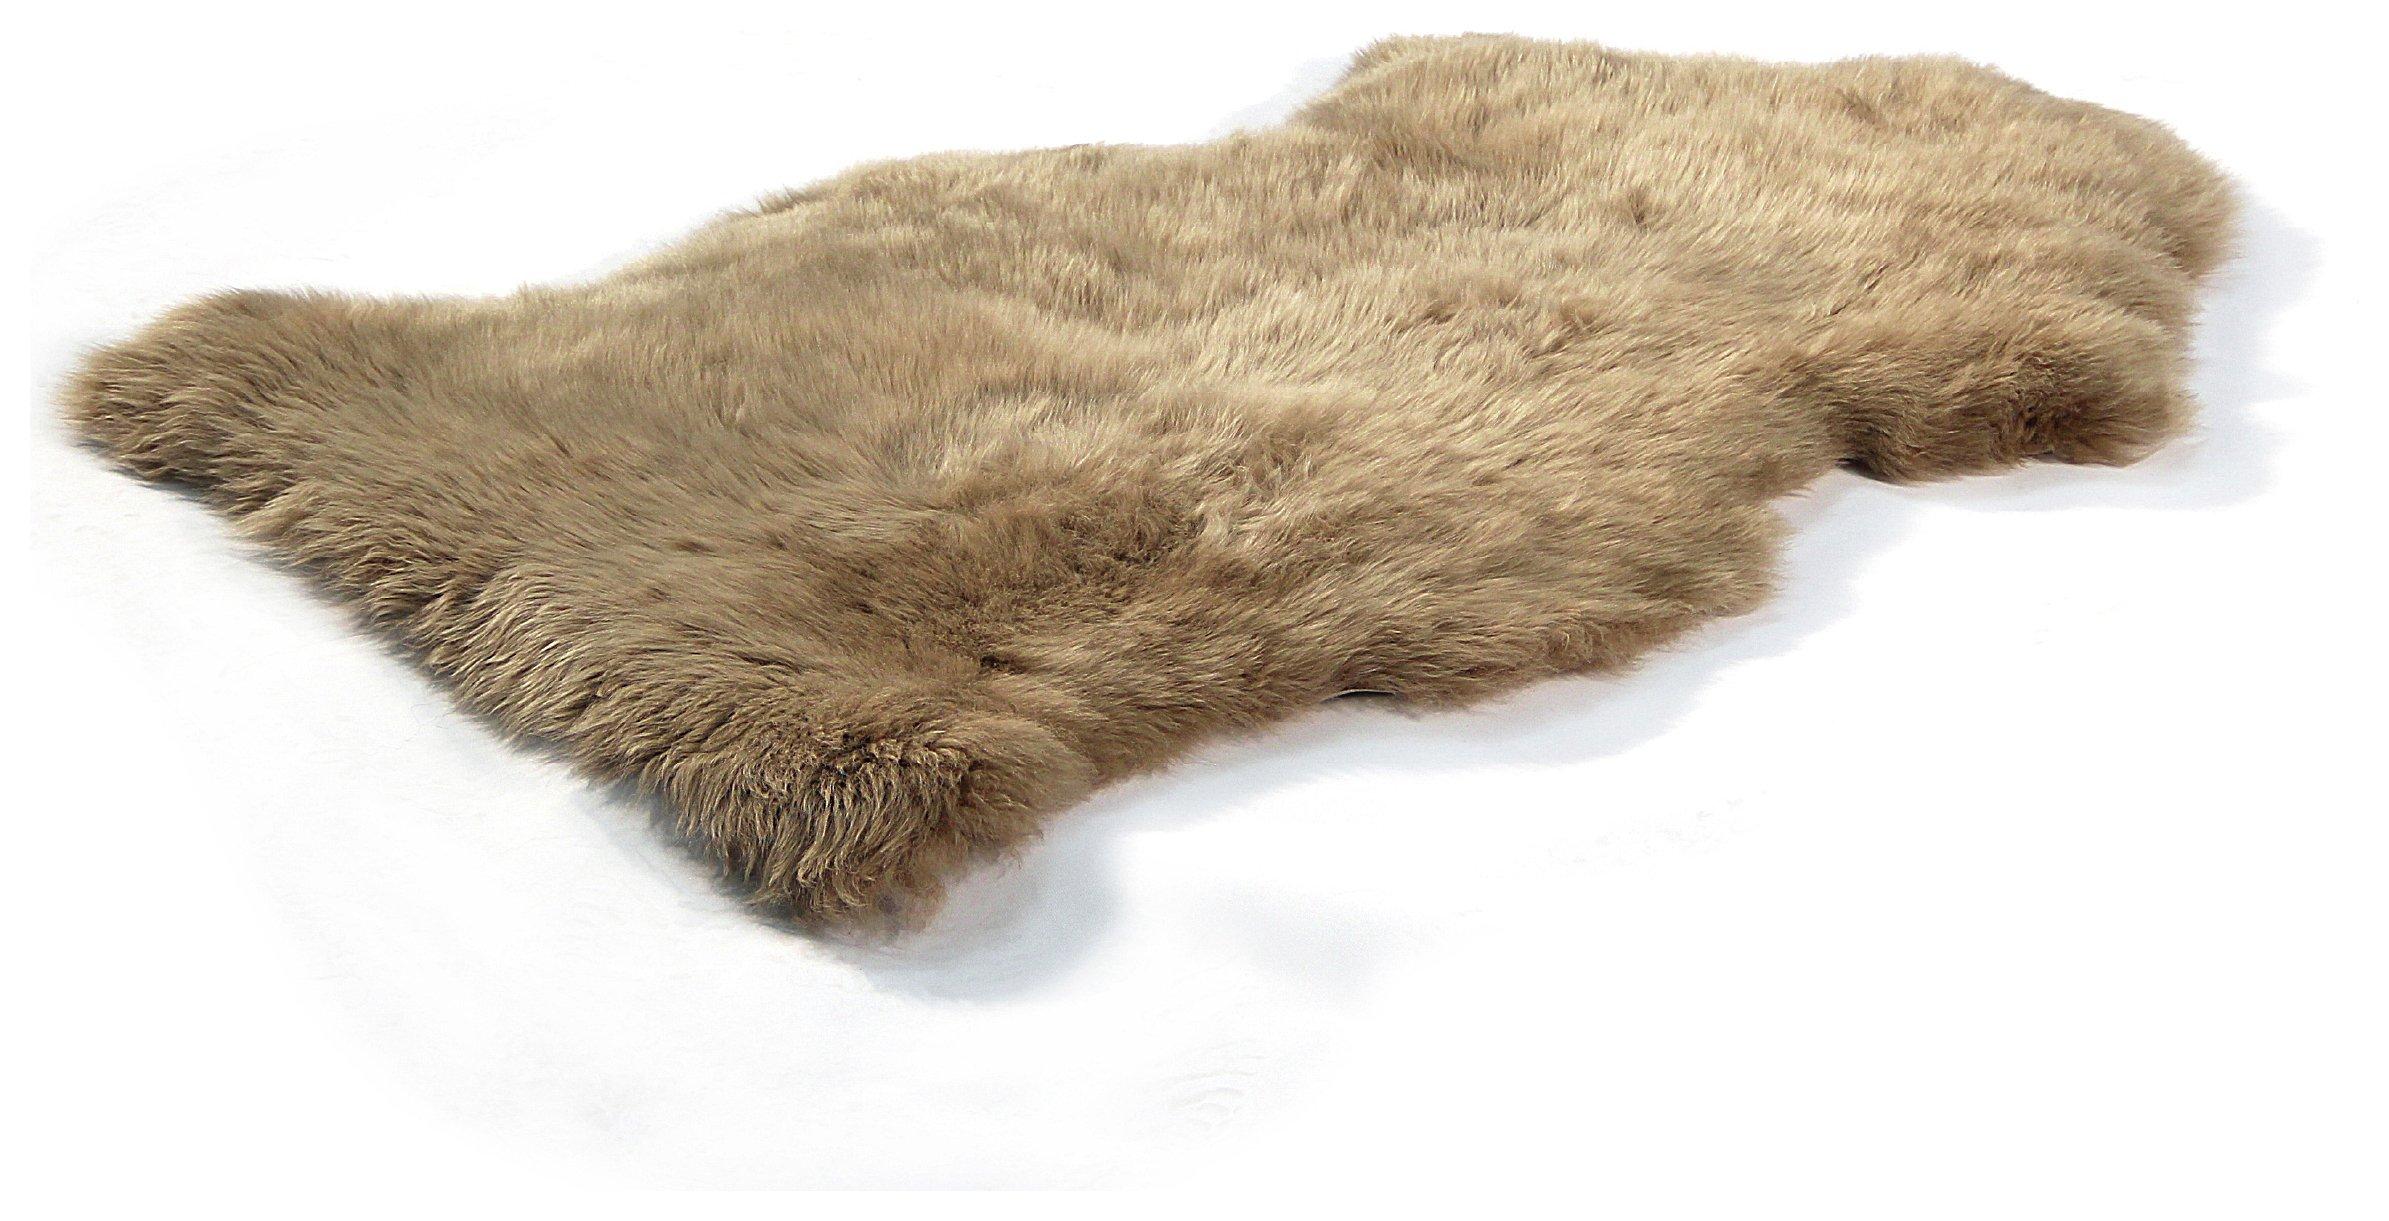 Image of Bowron Sheepskin Longwool Rug - 60 x 95cm - Paco.